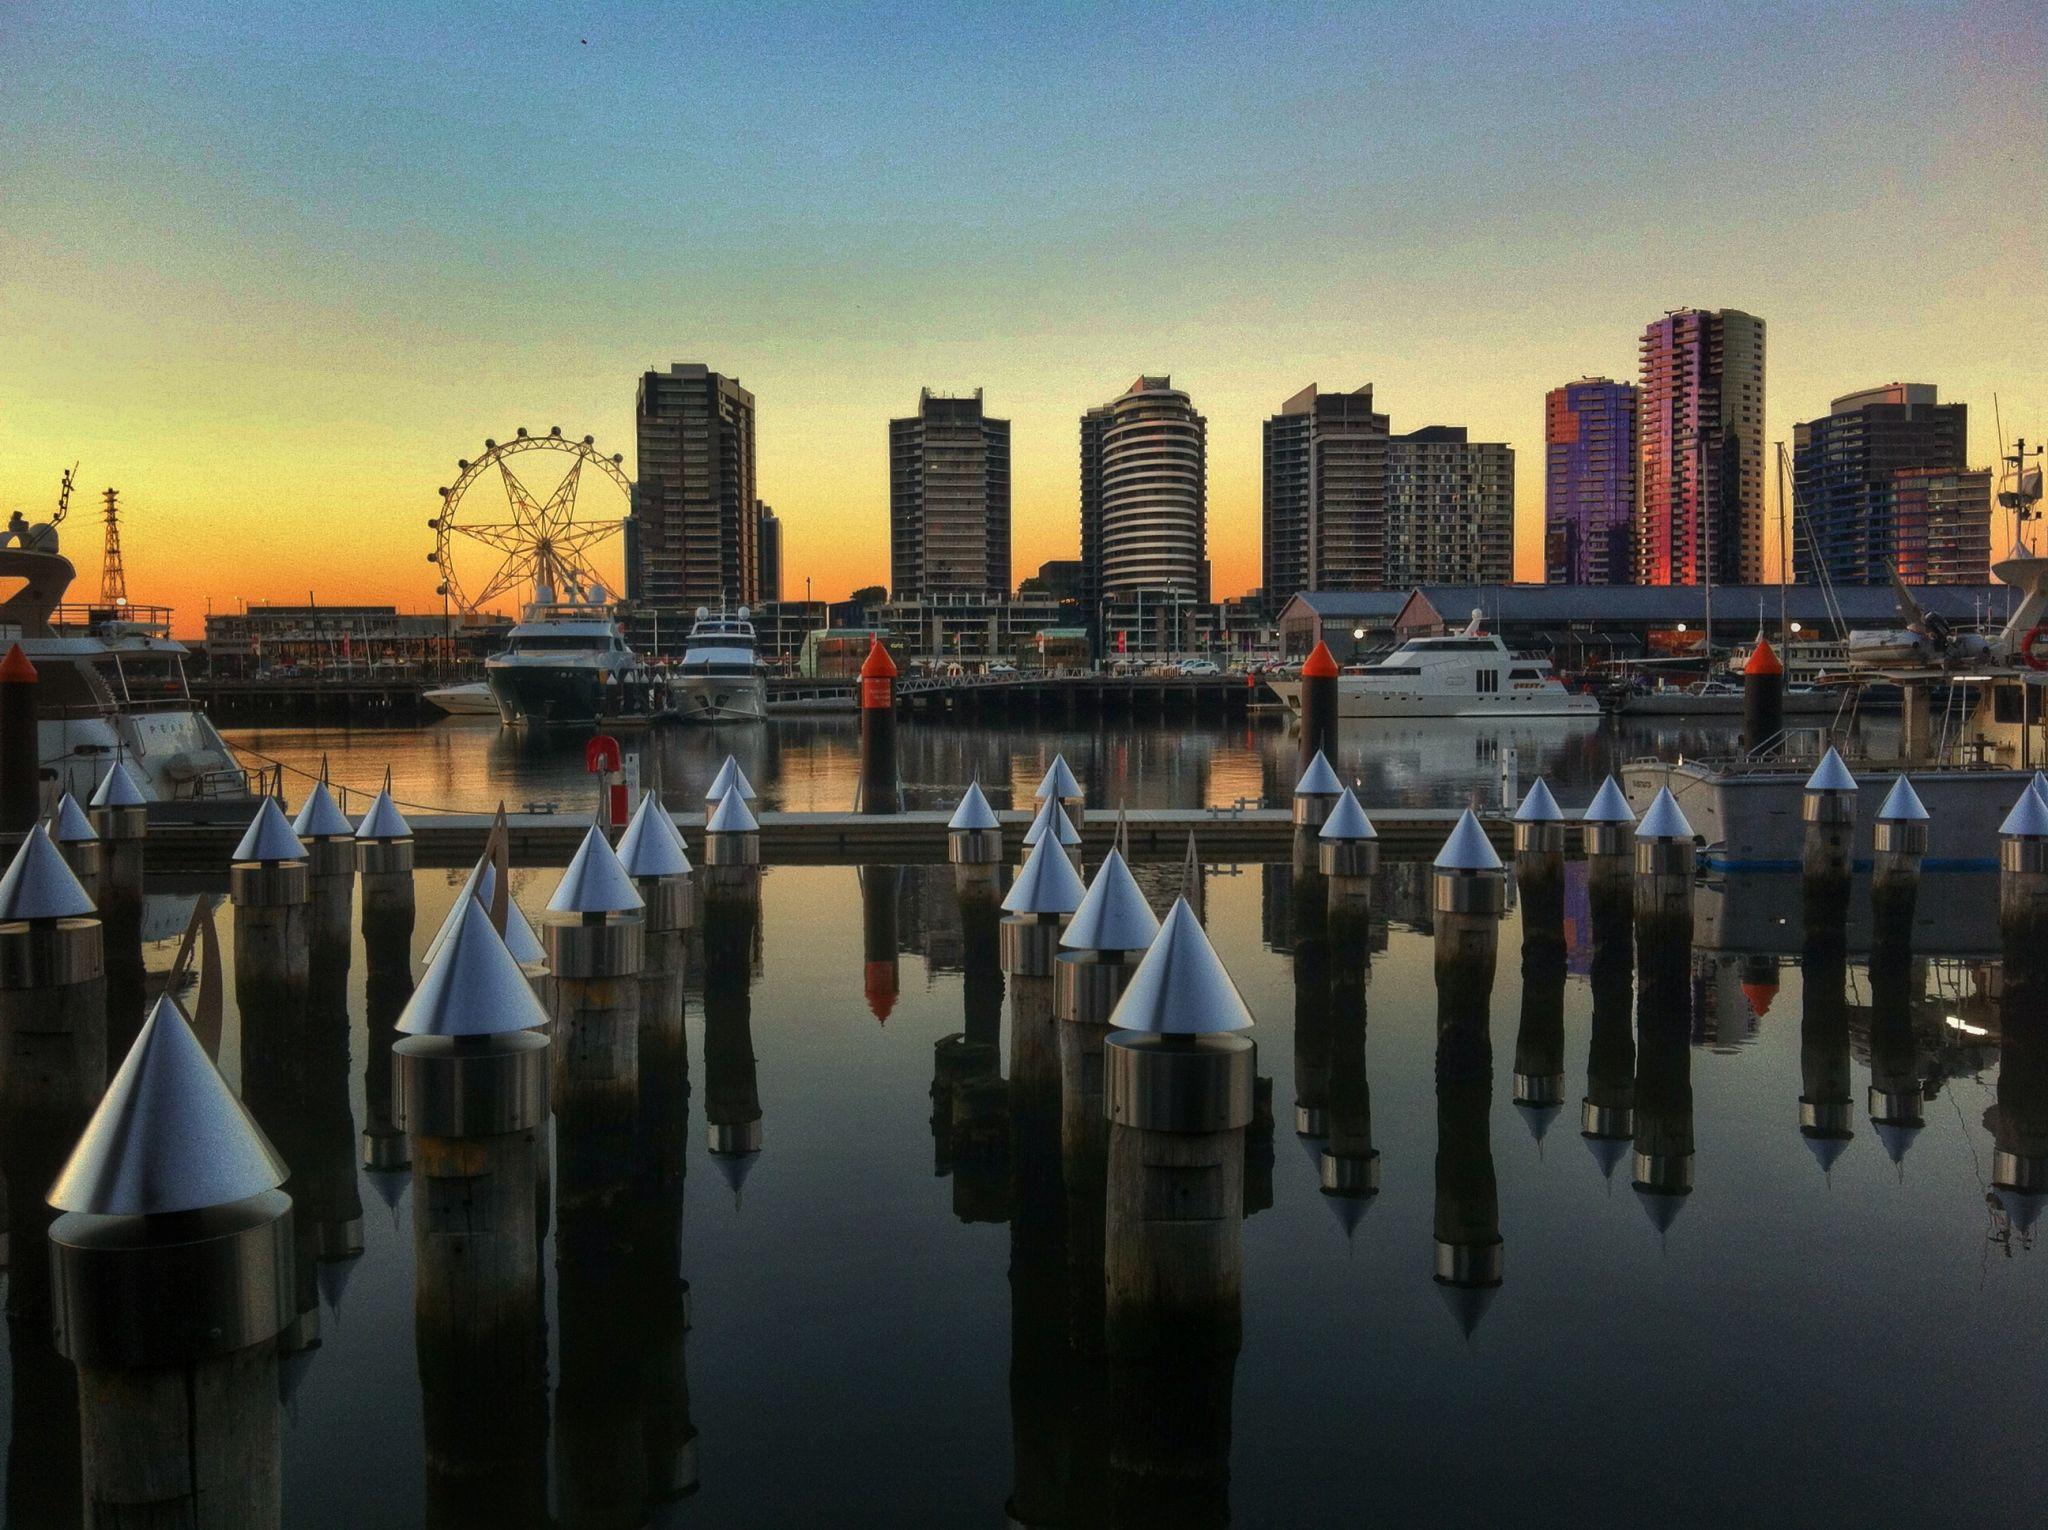 Victoria Harbour, Docklands Melbourne, Australia